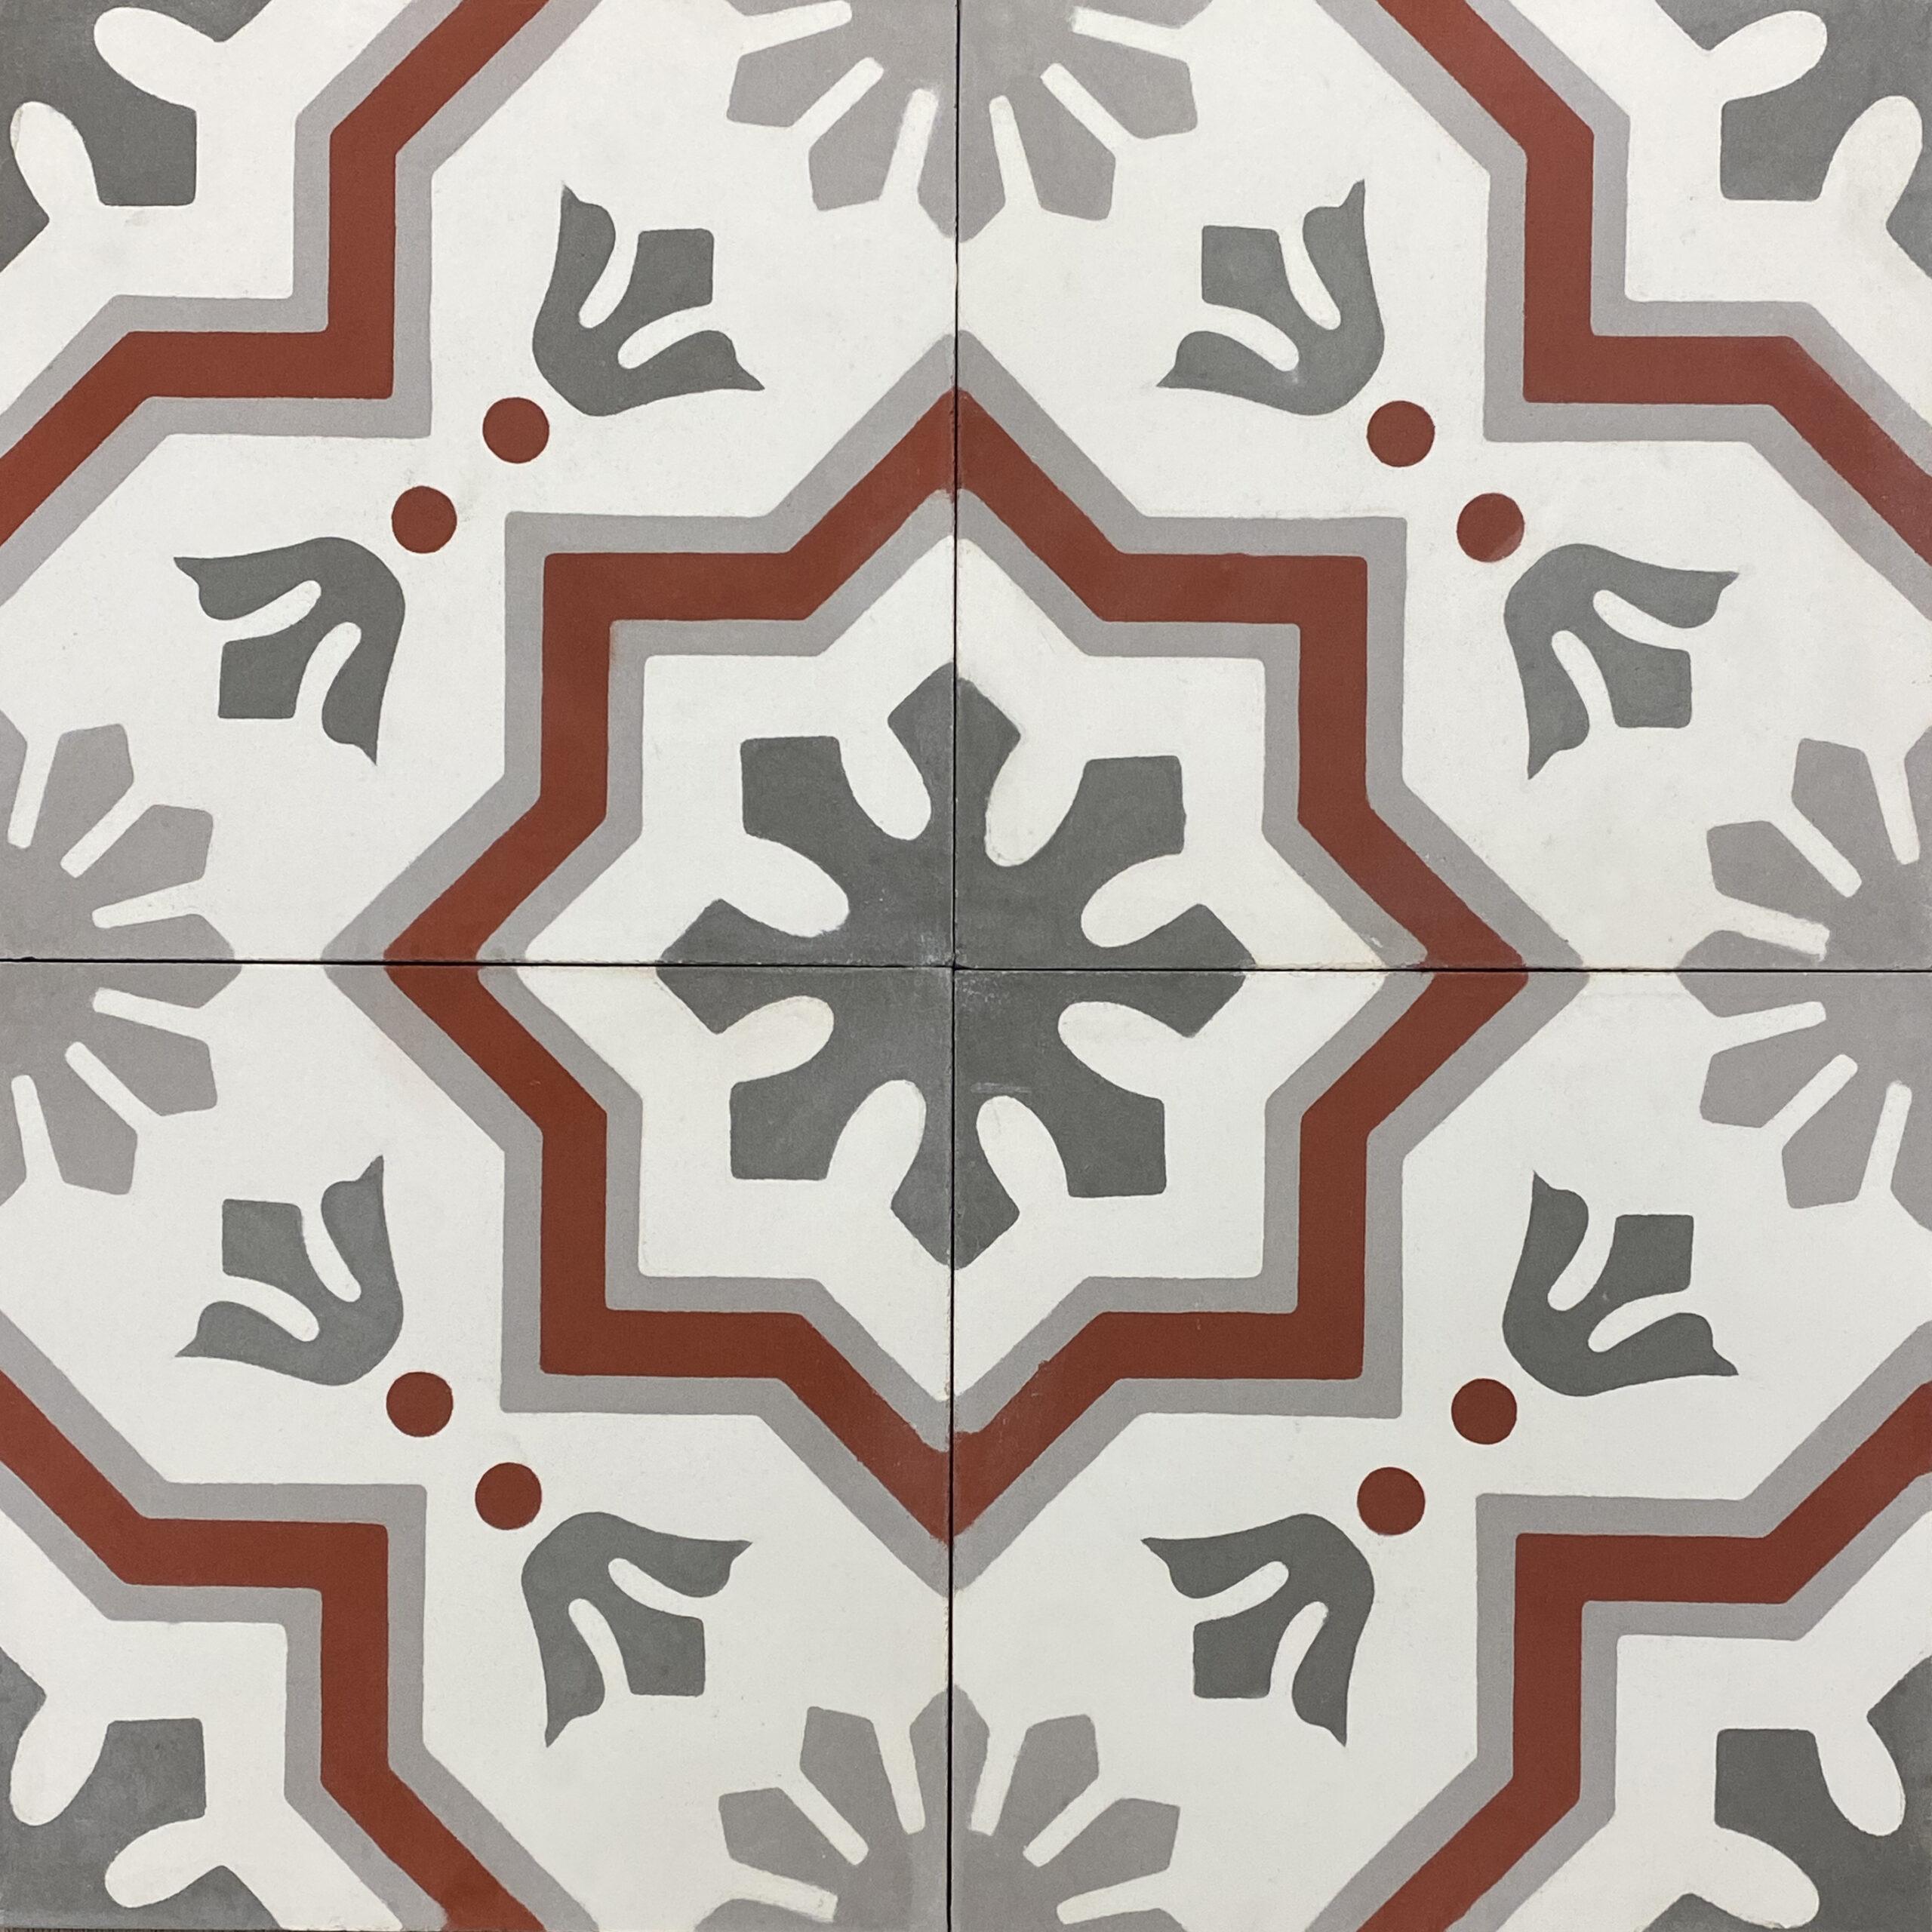 Koni Cement Tile KCT 08